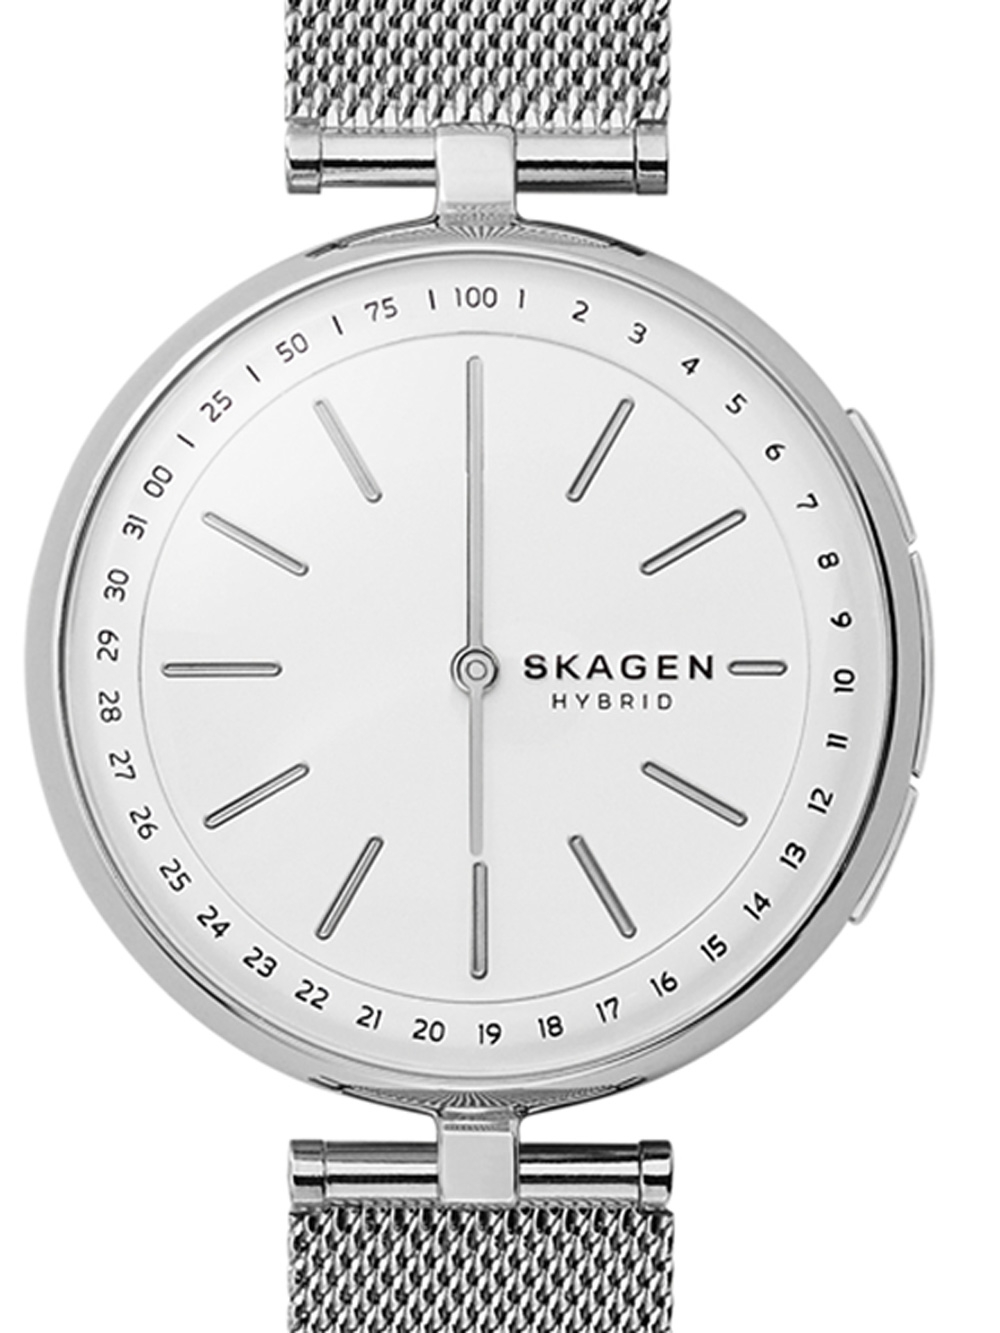 Skagen SKT1400 Falster Hybdrid Smartwatch Damen 36mm 3ATM